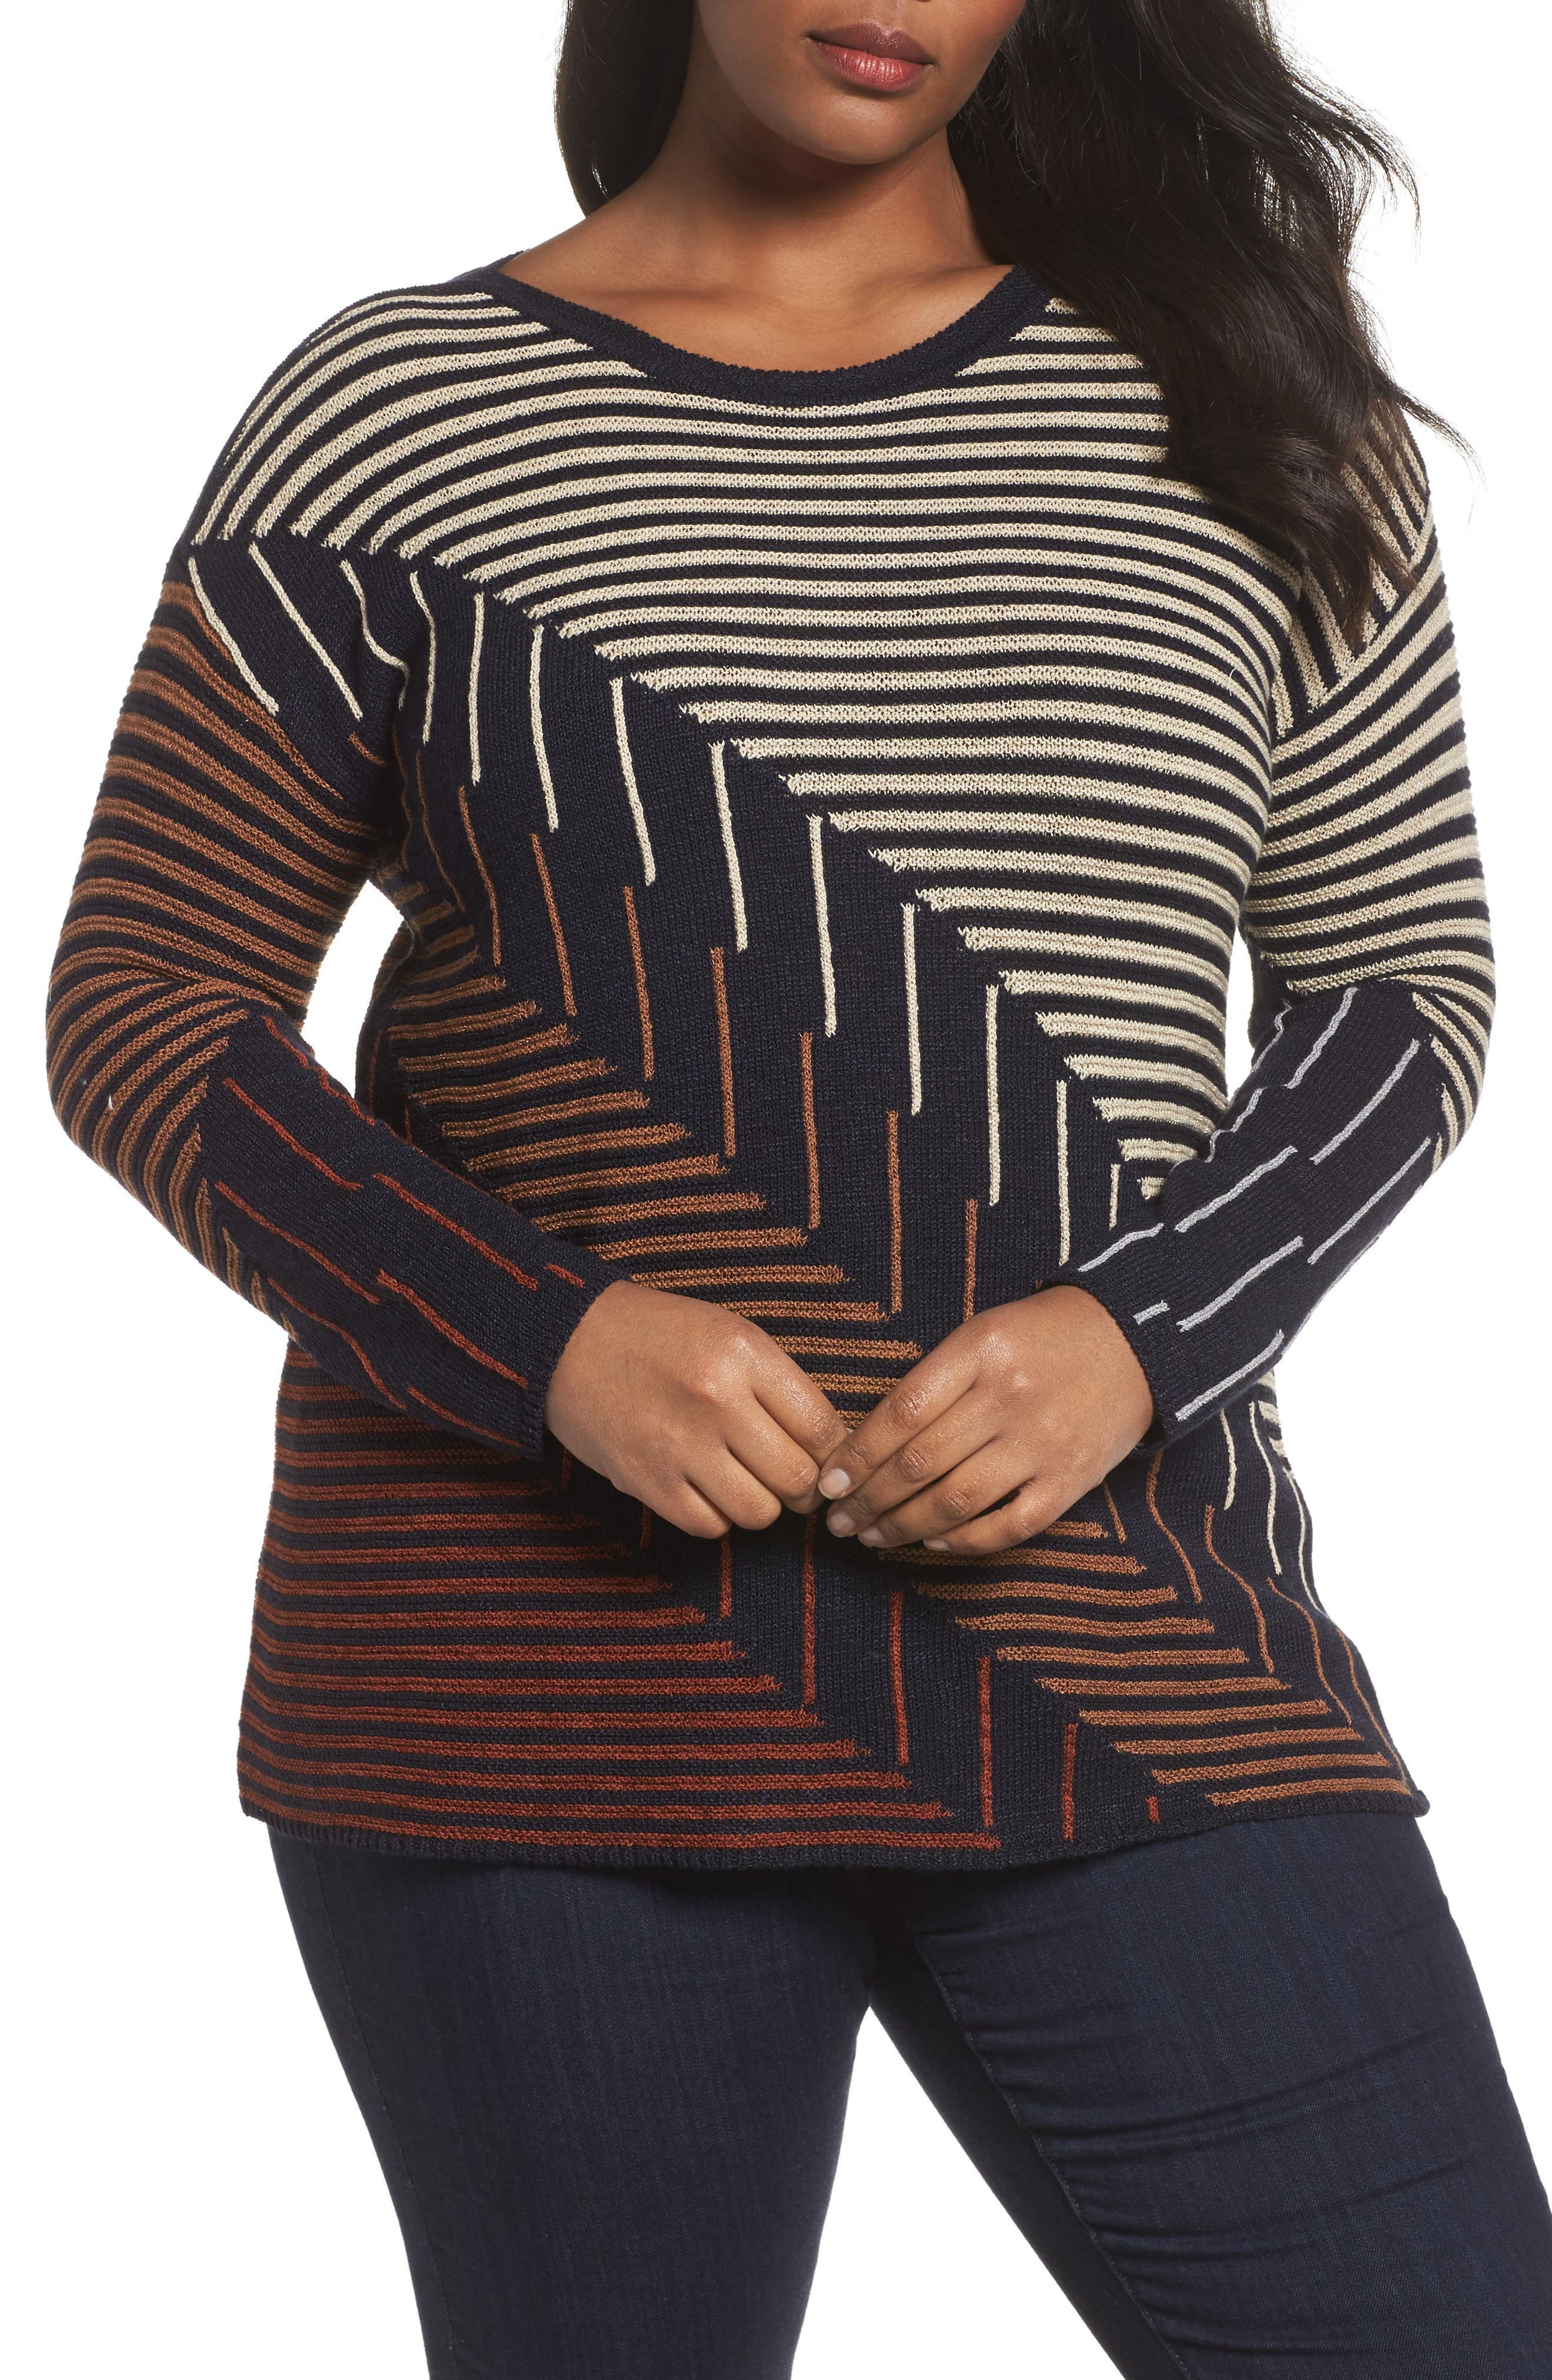 Main Image - NIC+ZOE Lagoon Sweater (Plus Size)